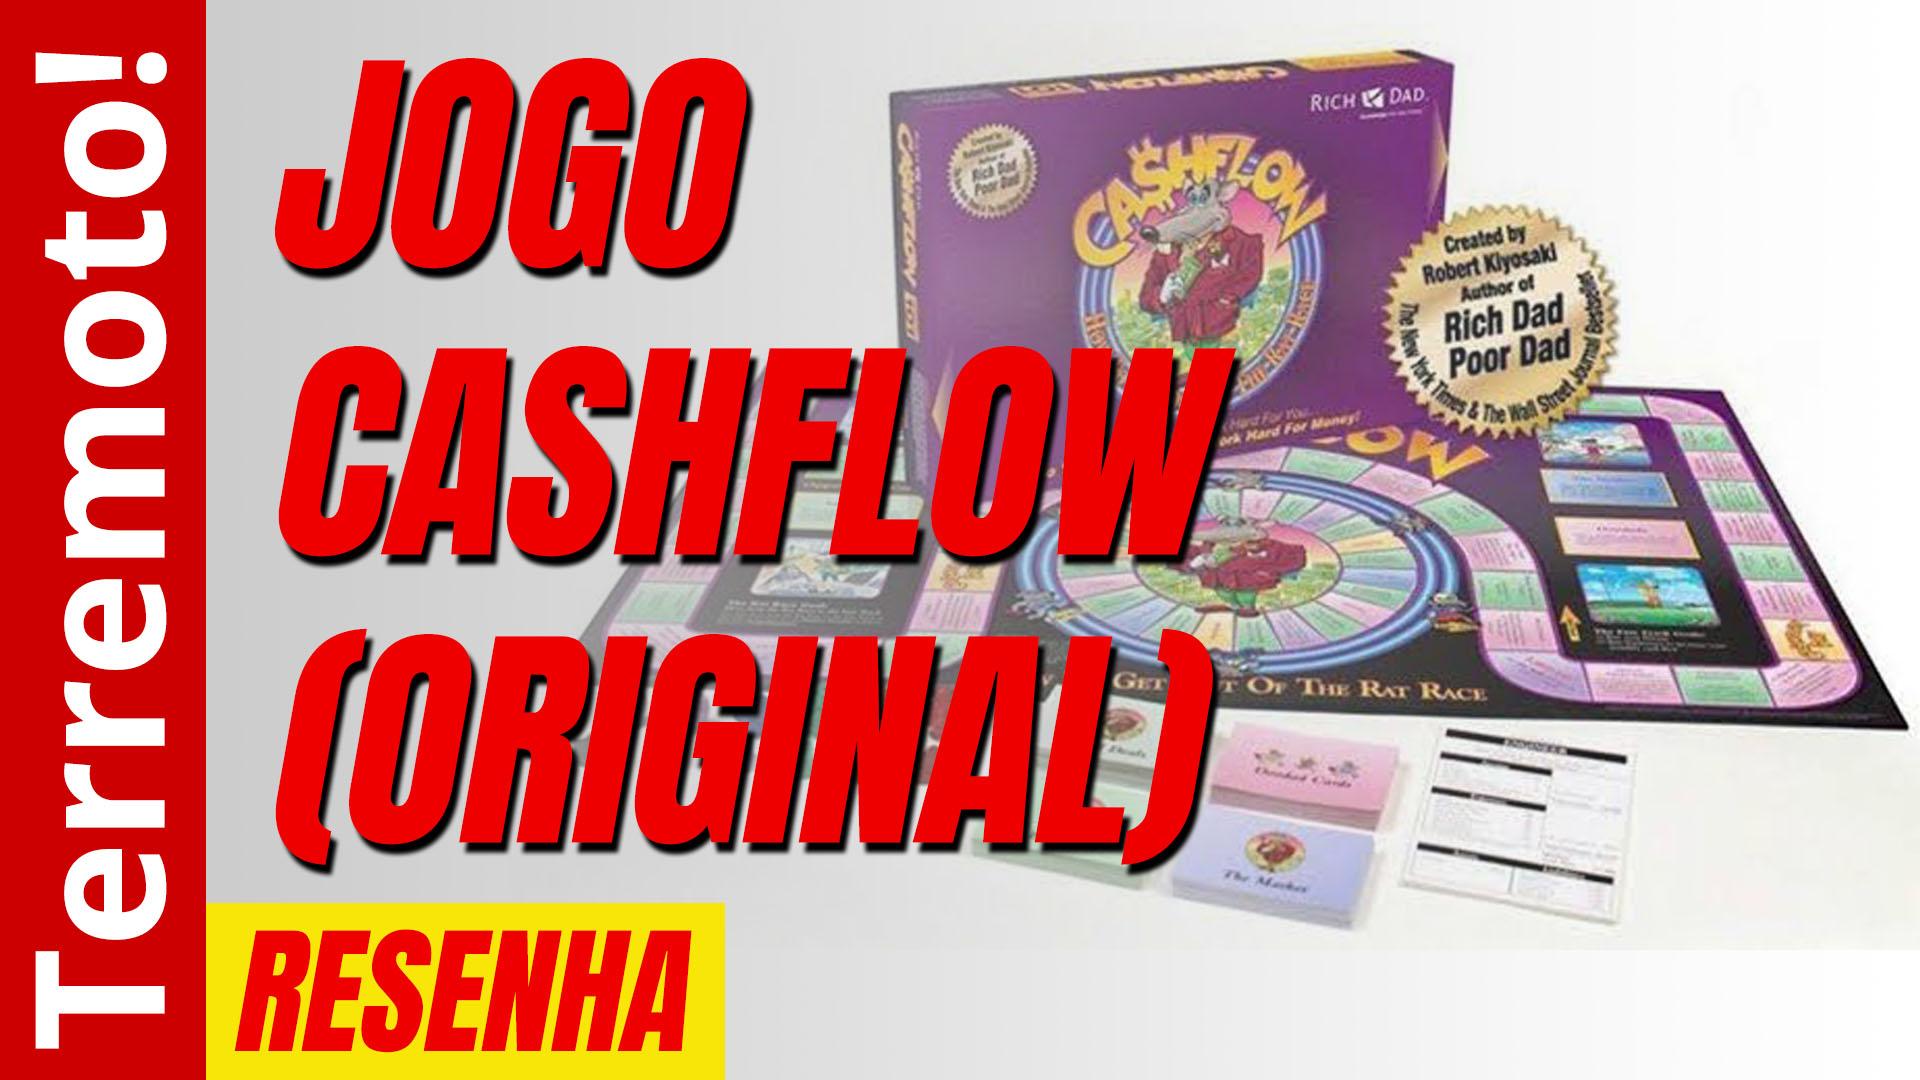 Resenha do jogo Cashflow, de Robert Kiyosaki